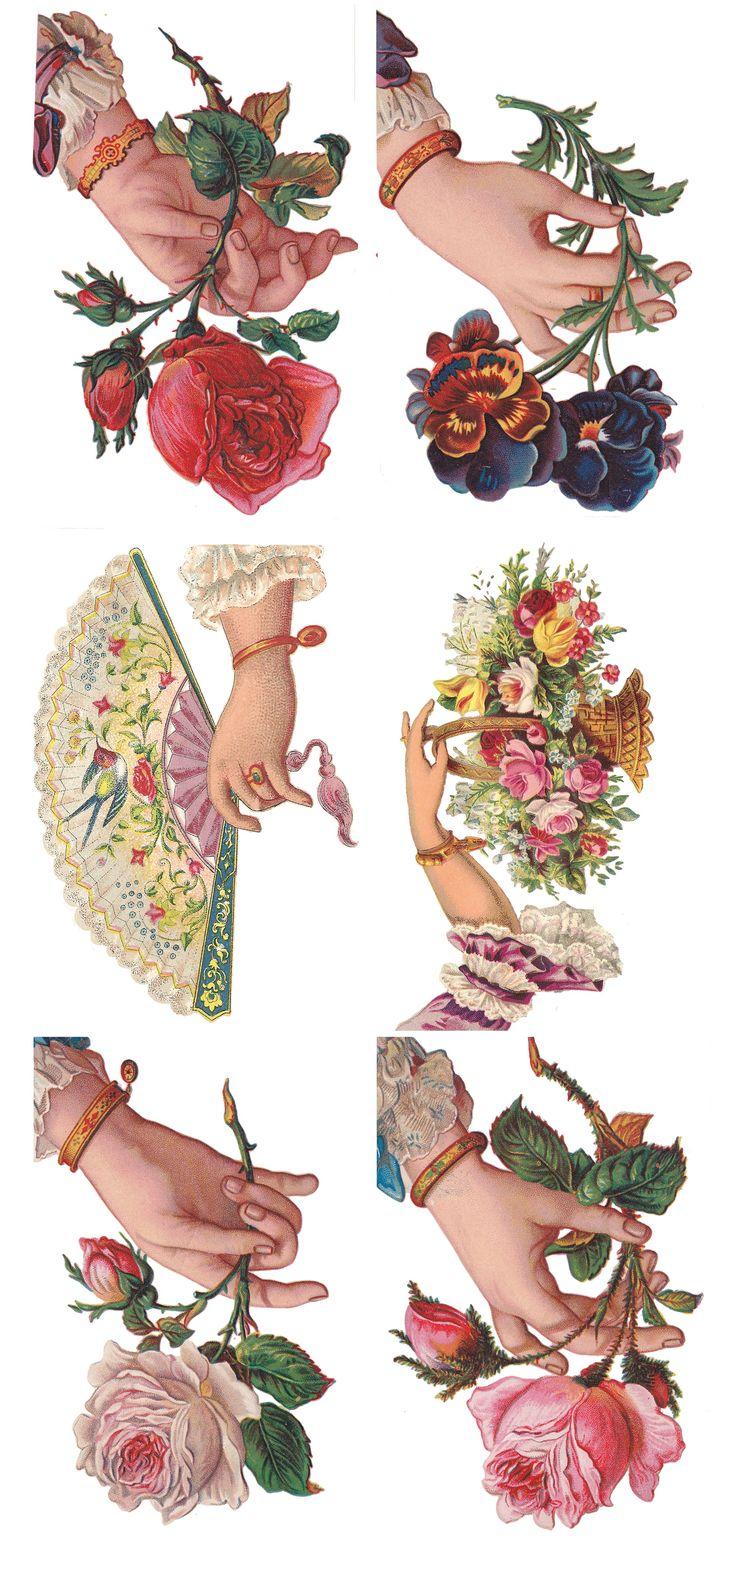 103 best antique hands fans and shoes images on pinterest